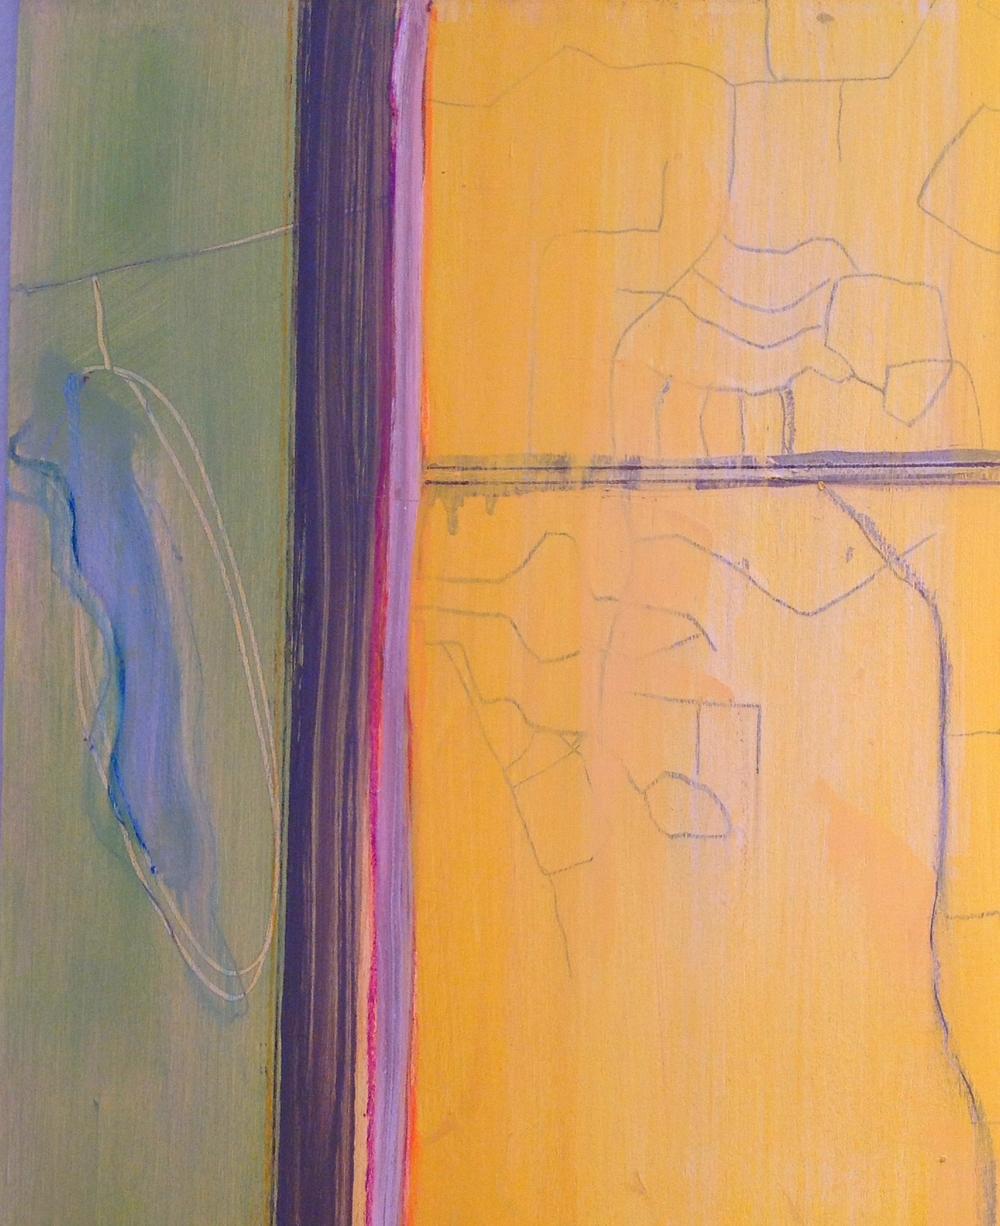 Artmap Section #22